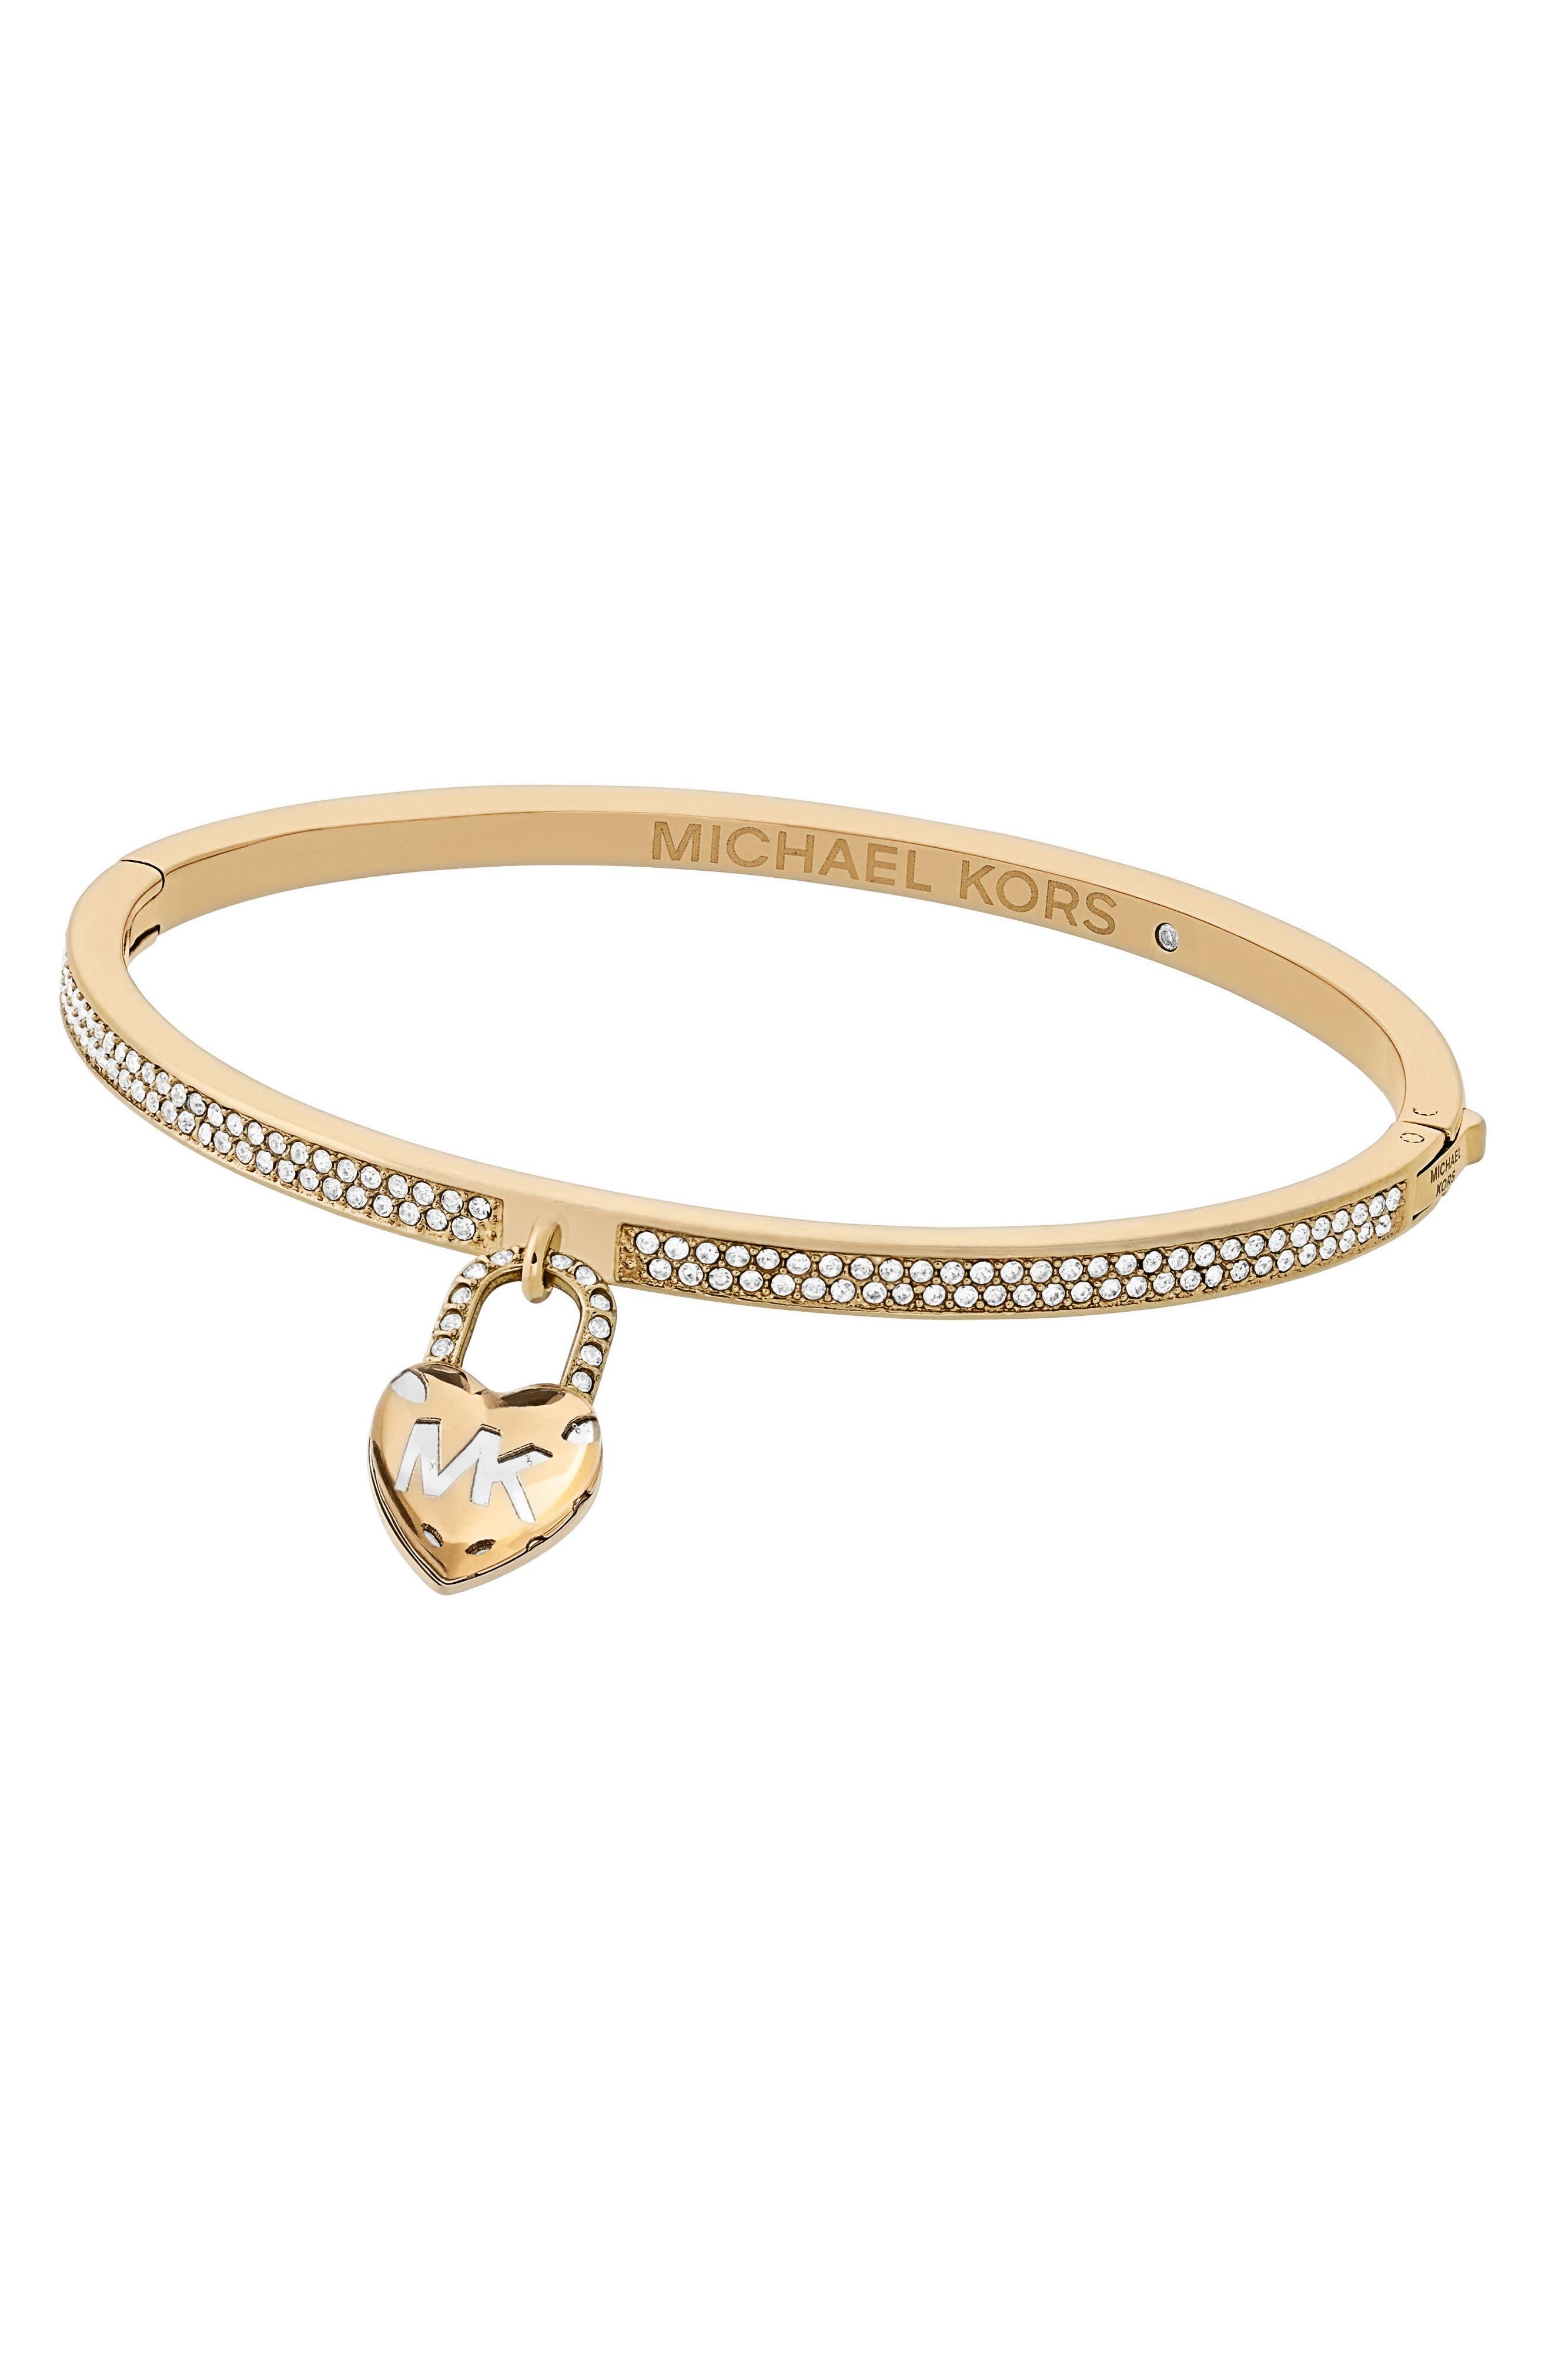 Michael Kors Bracelets CRYSTAL HINGE BANGLE